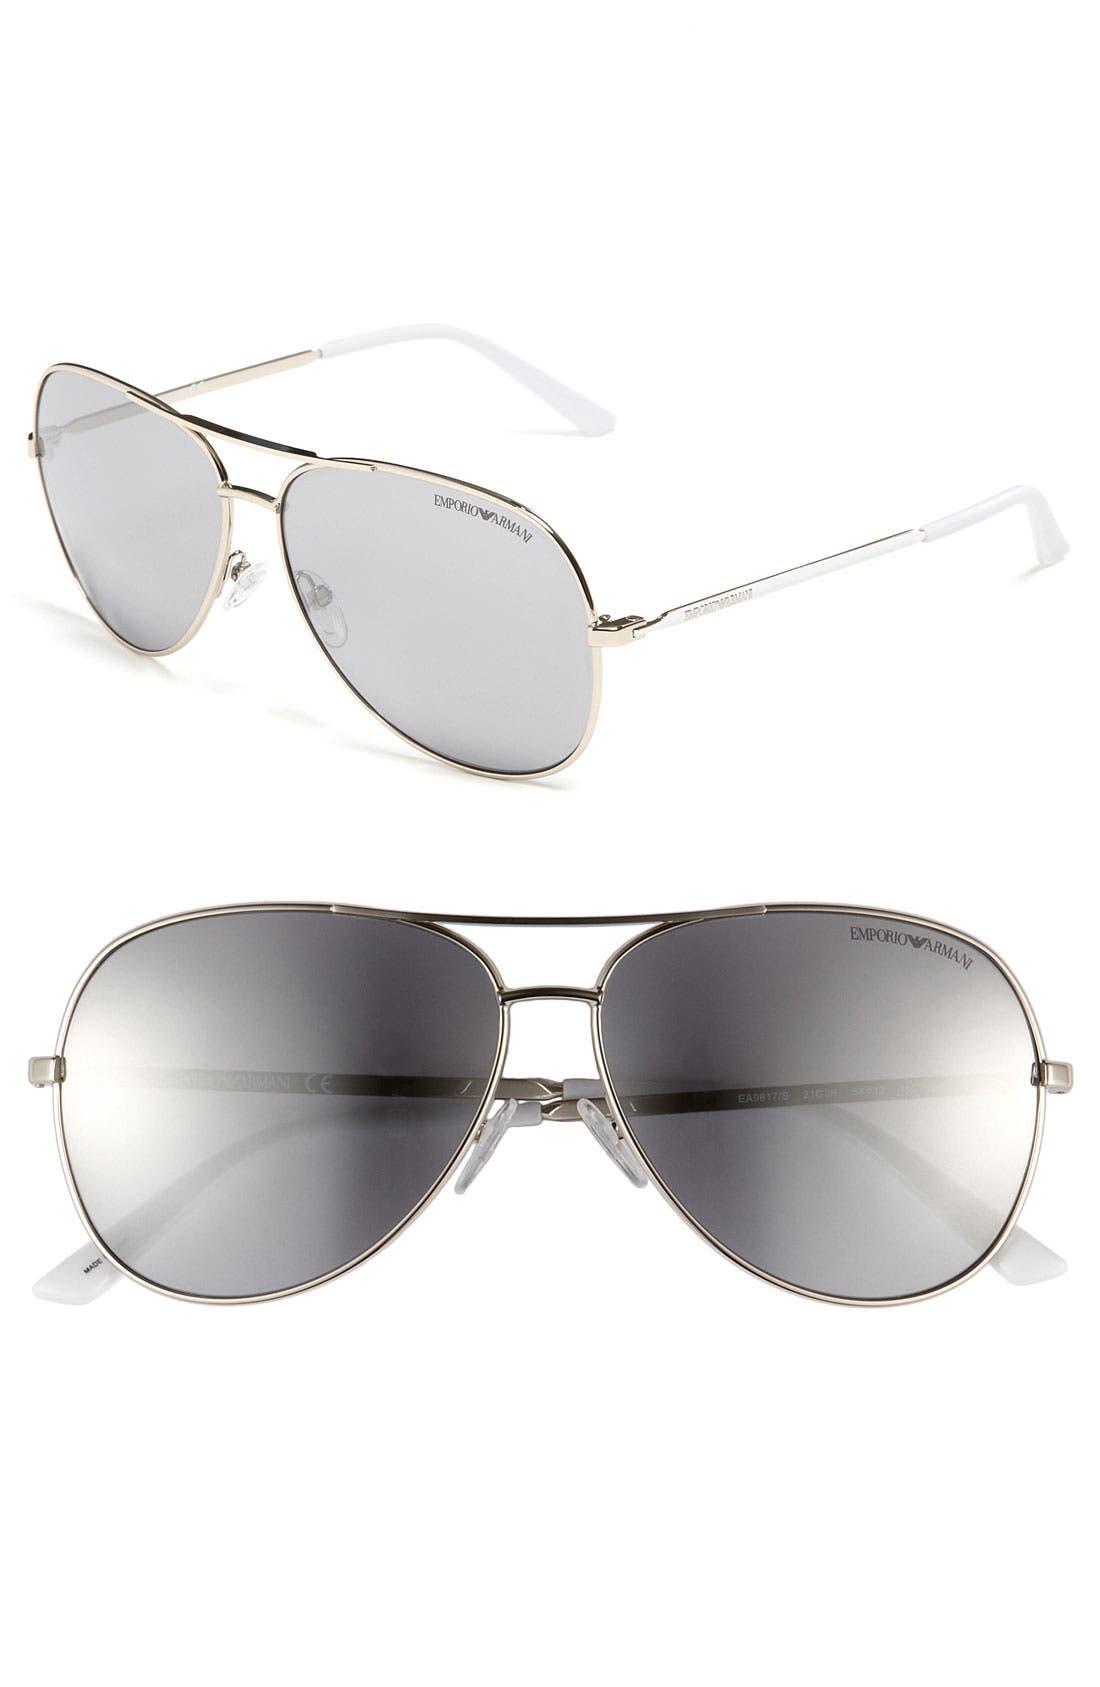 Main Image - Emporio Armani Metal Aviator Sunglasses